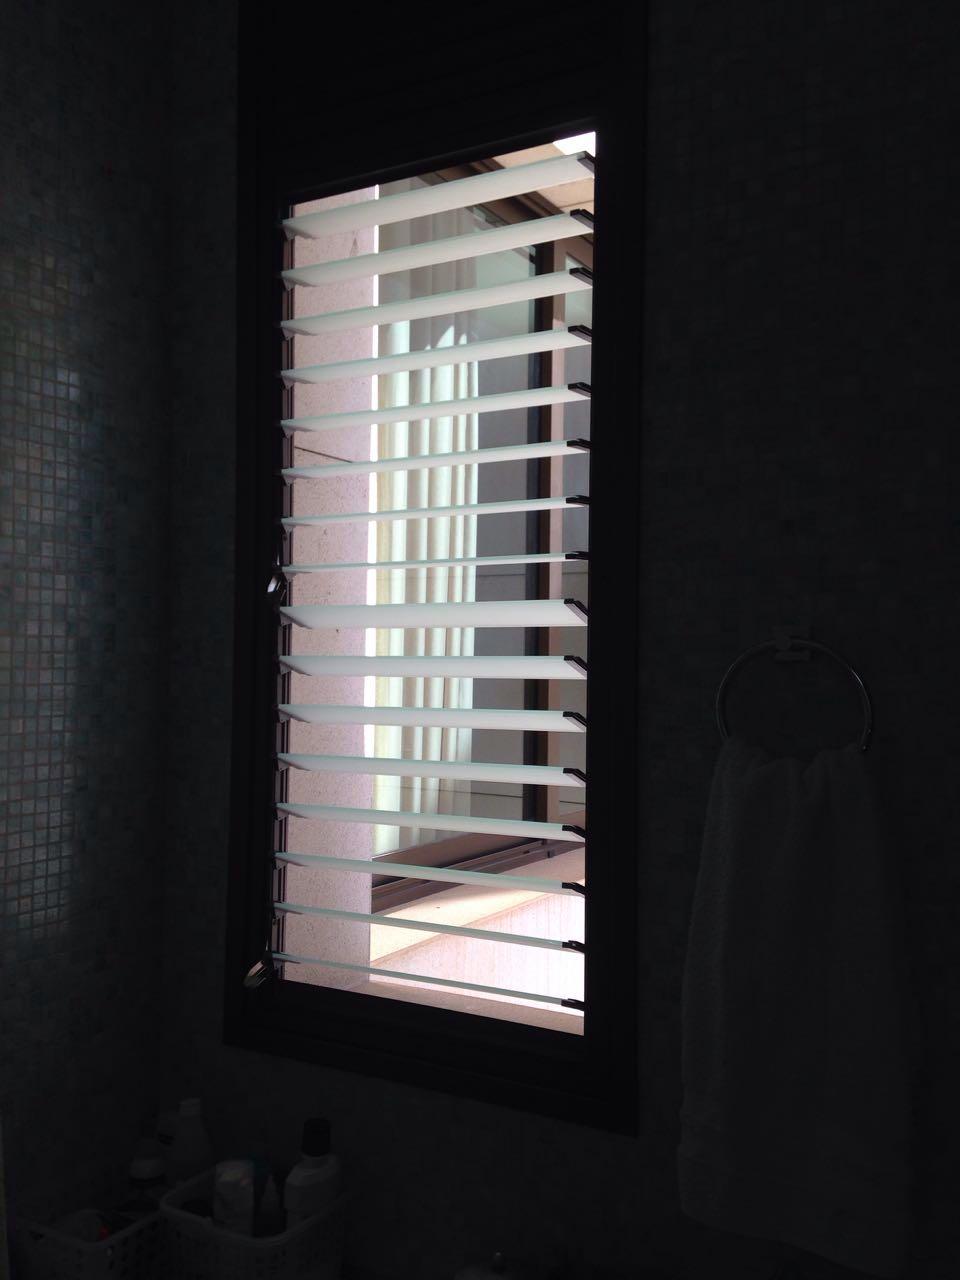 Vidroseg - Veneziana de vidro